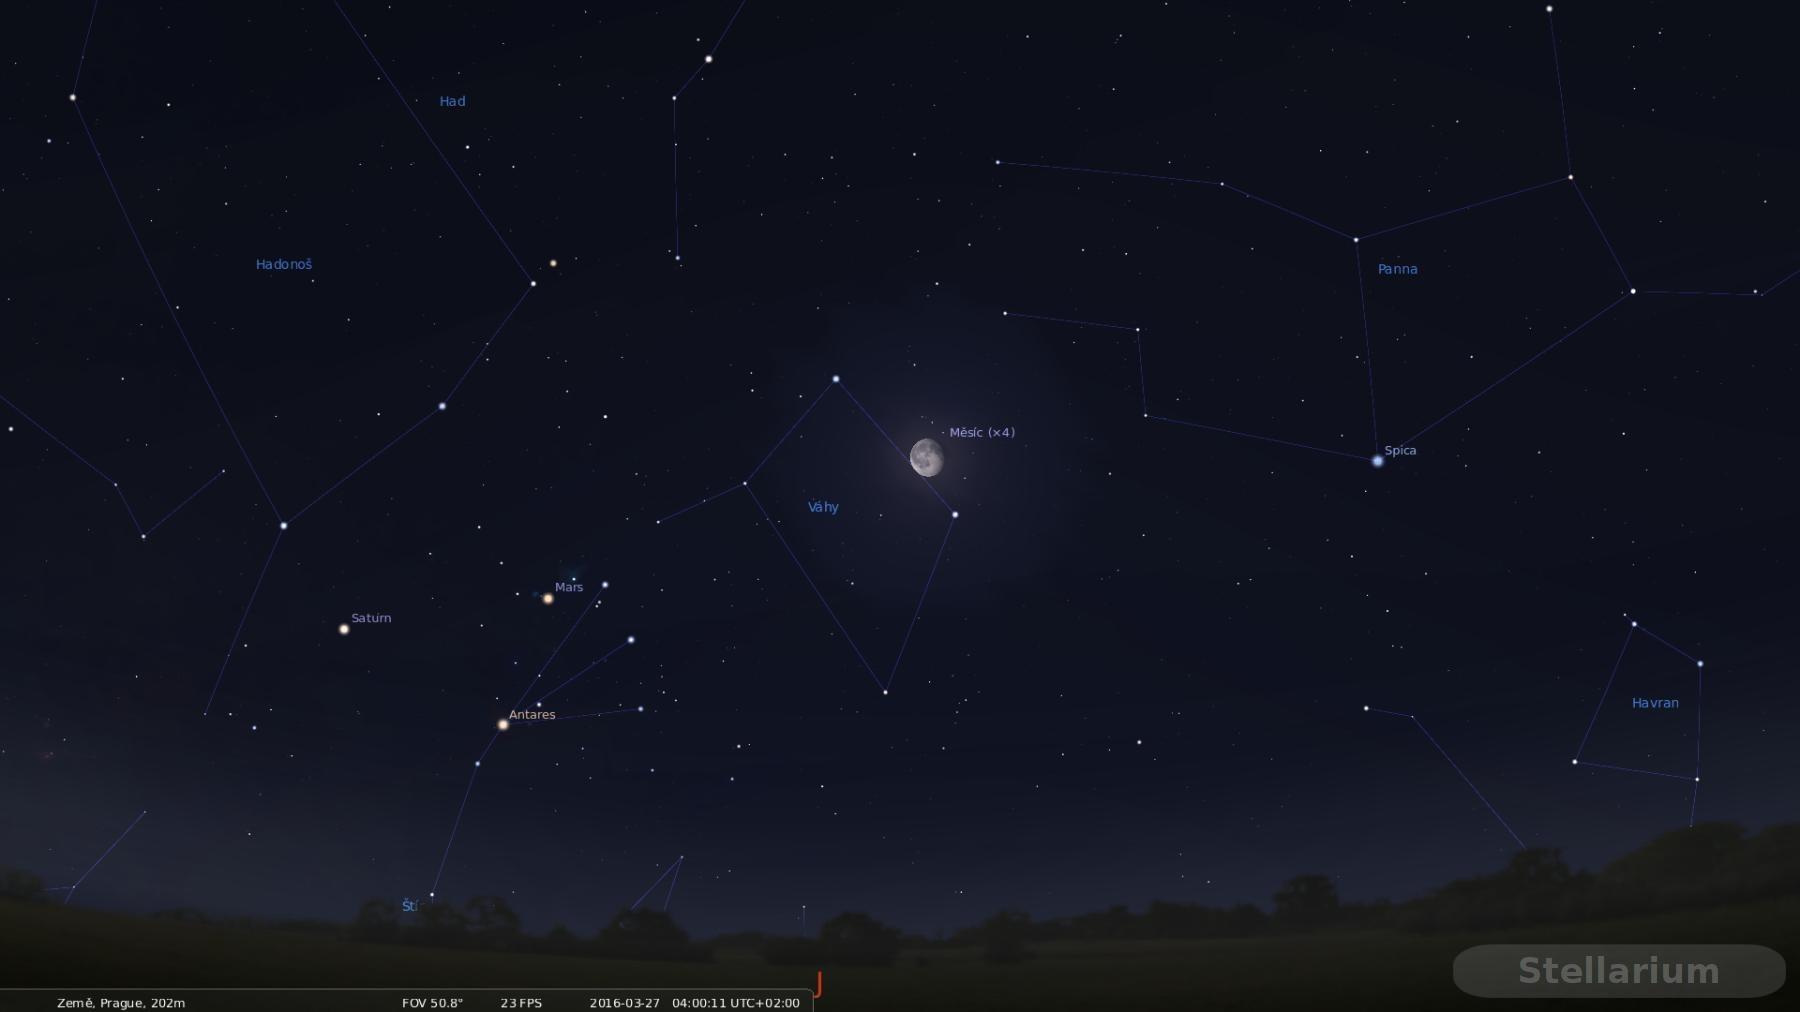 Saturn Mars A Antares Na Nočn 237 Obloze Exospace Cz